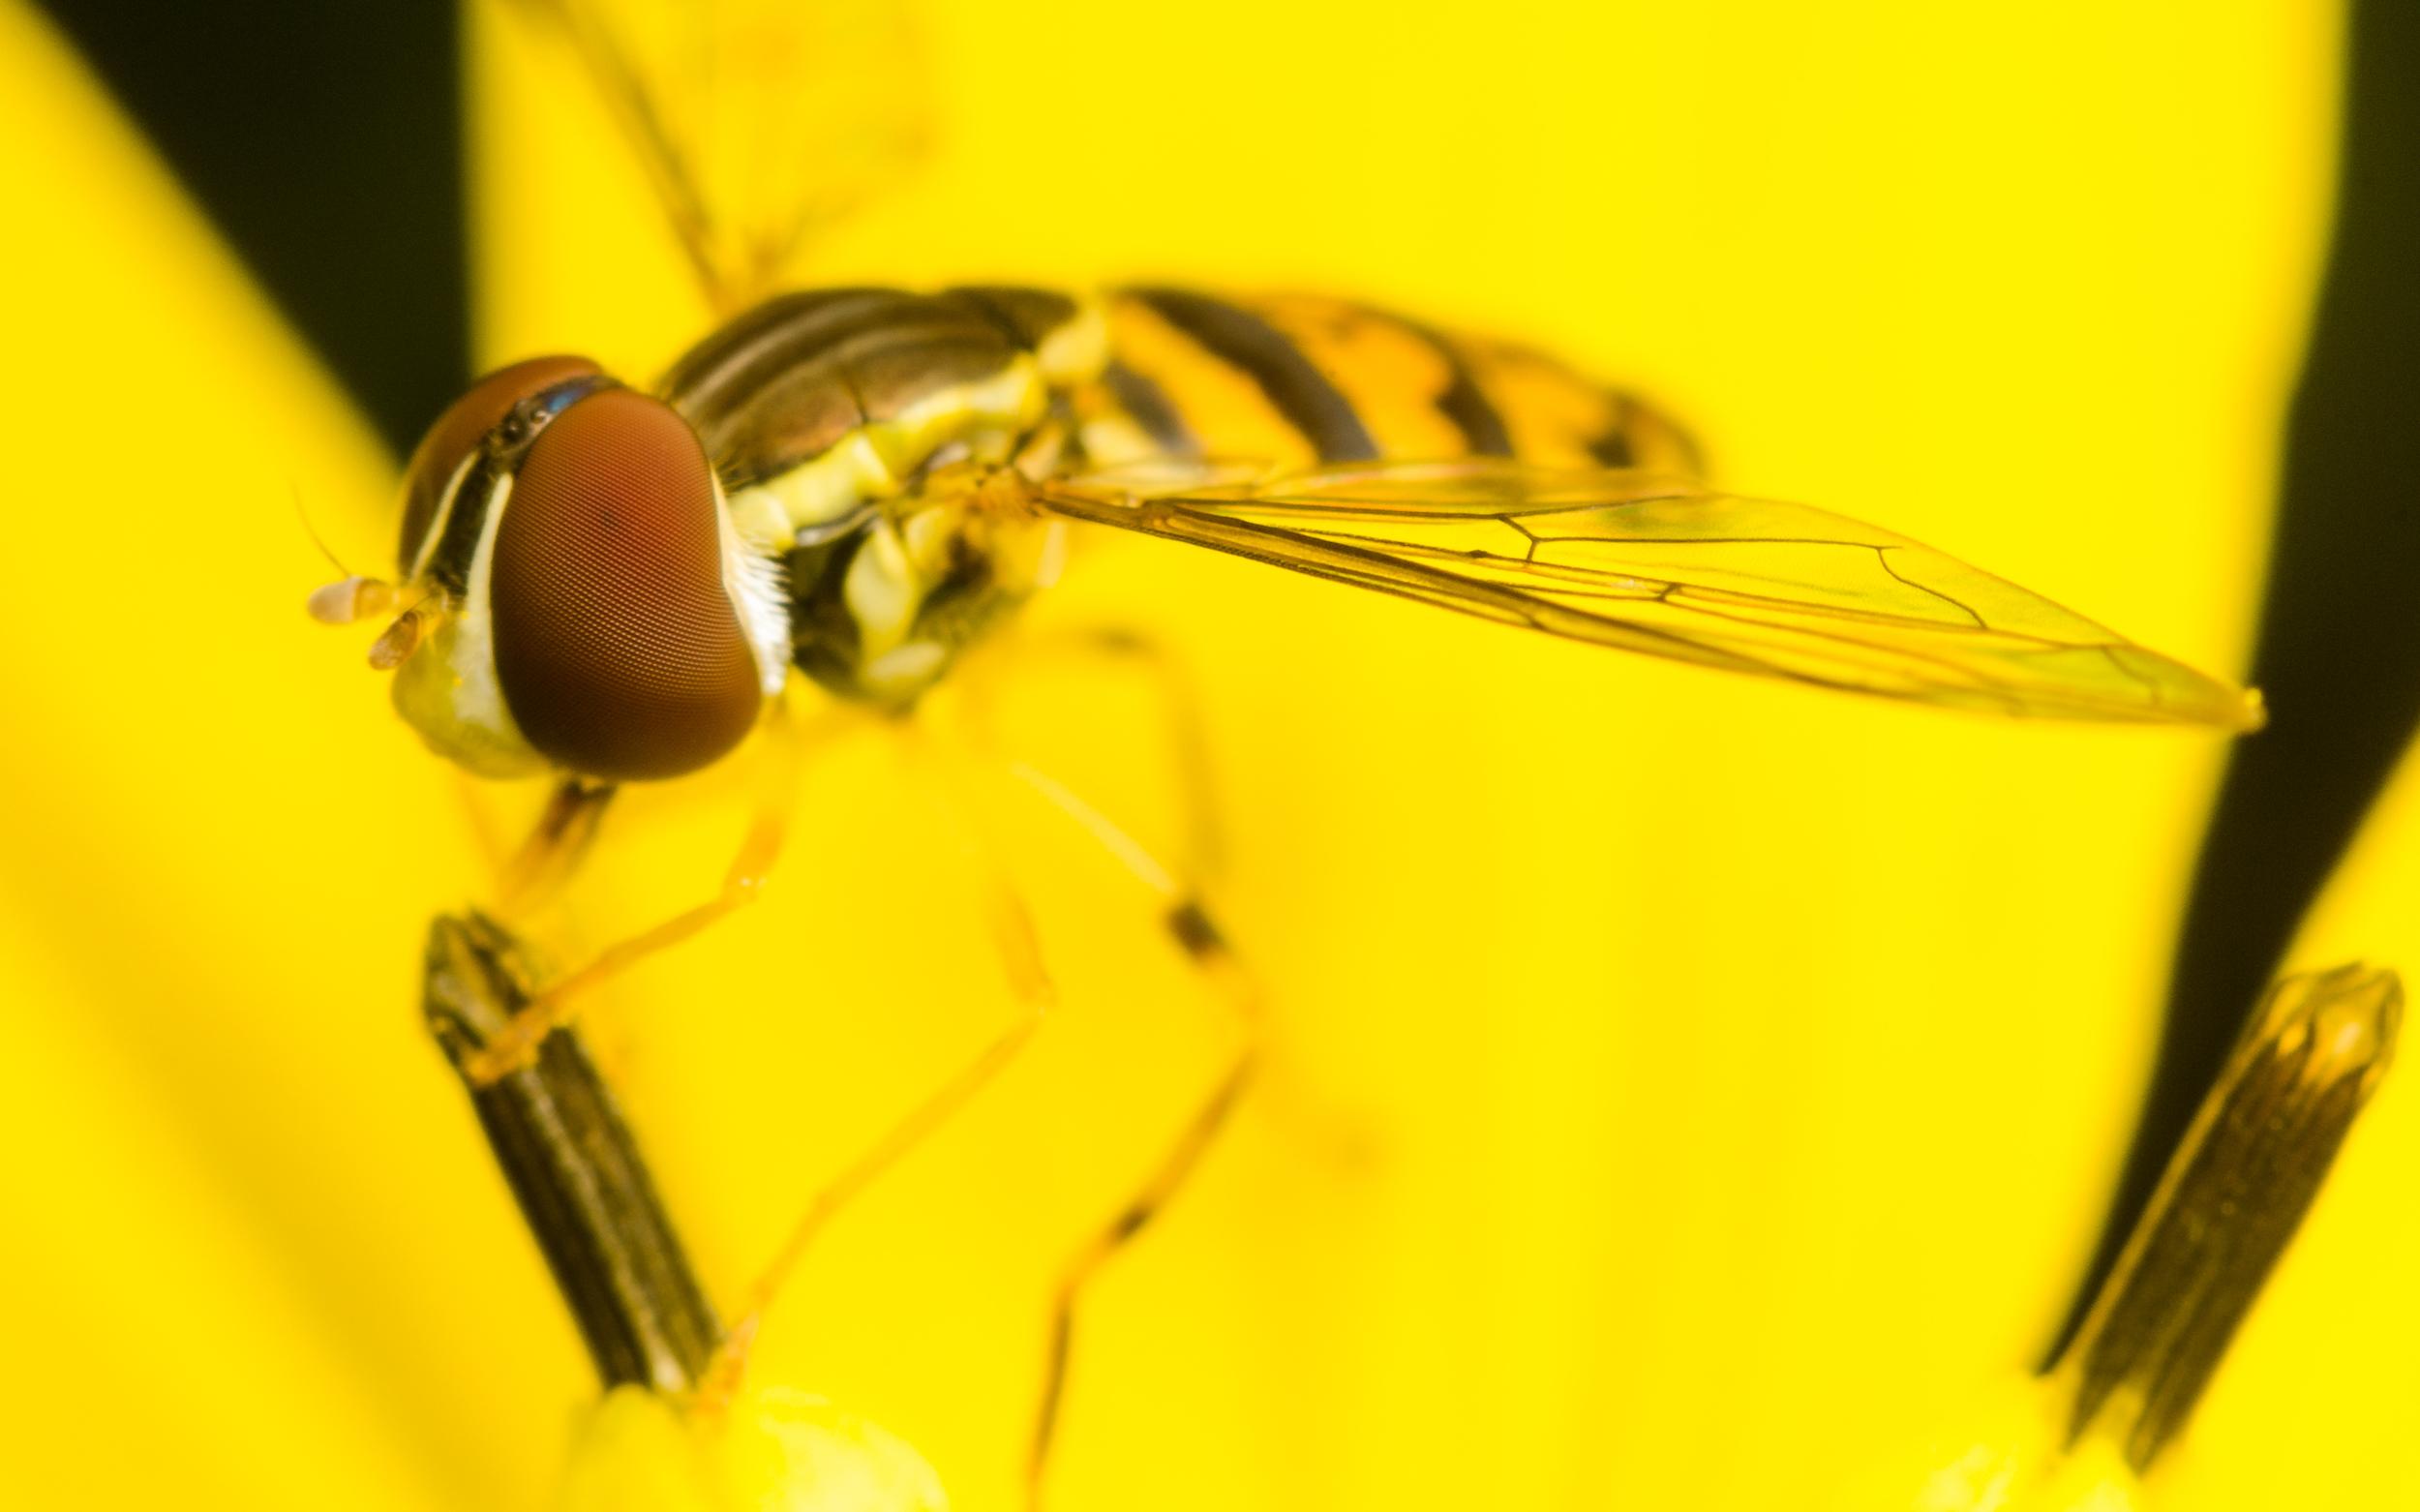 Hoverfly Nº 3